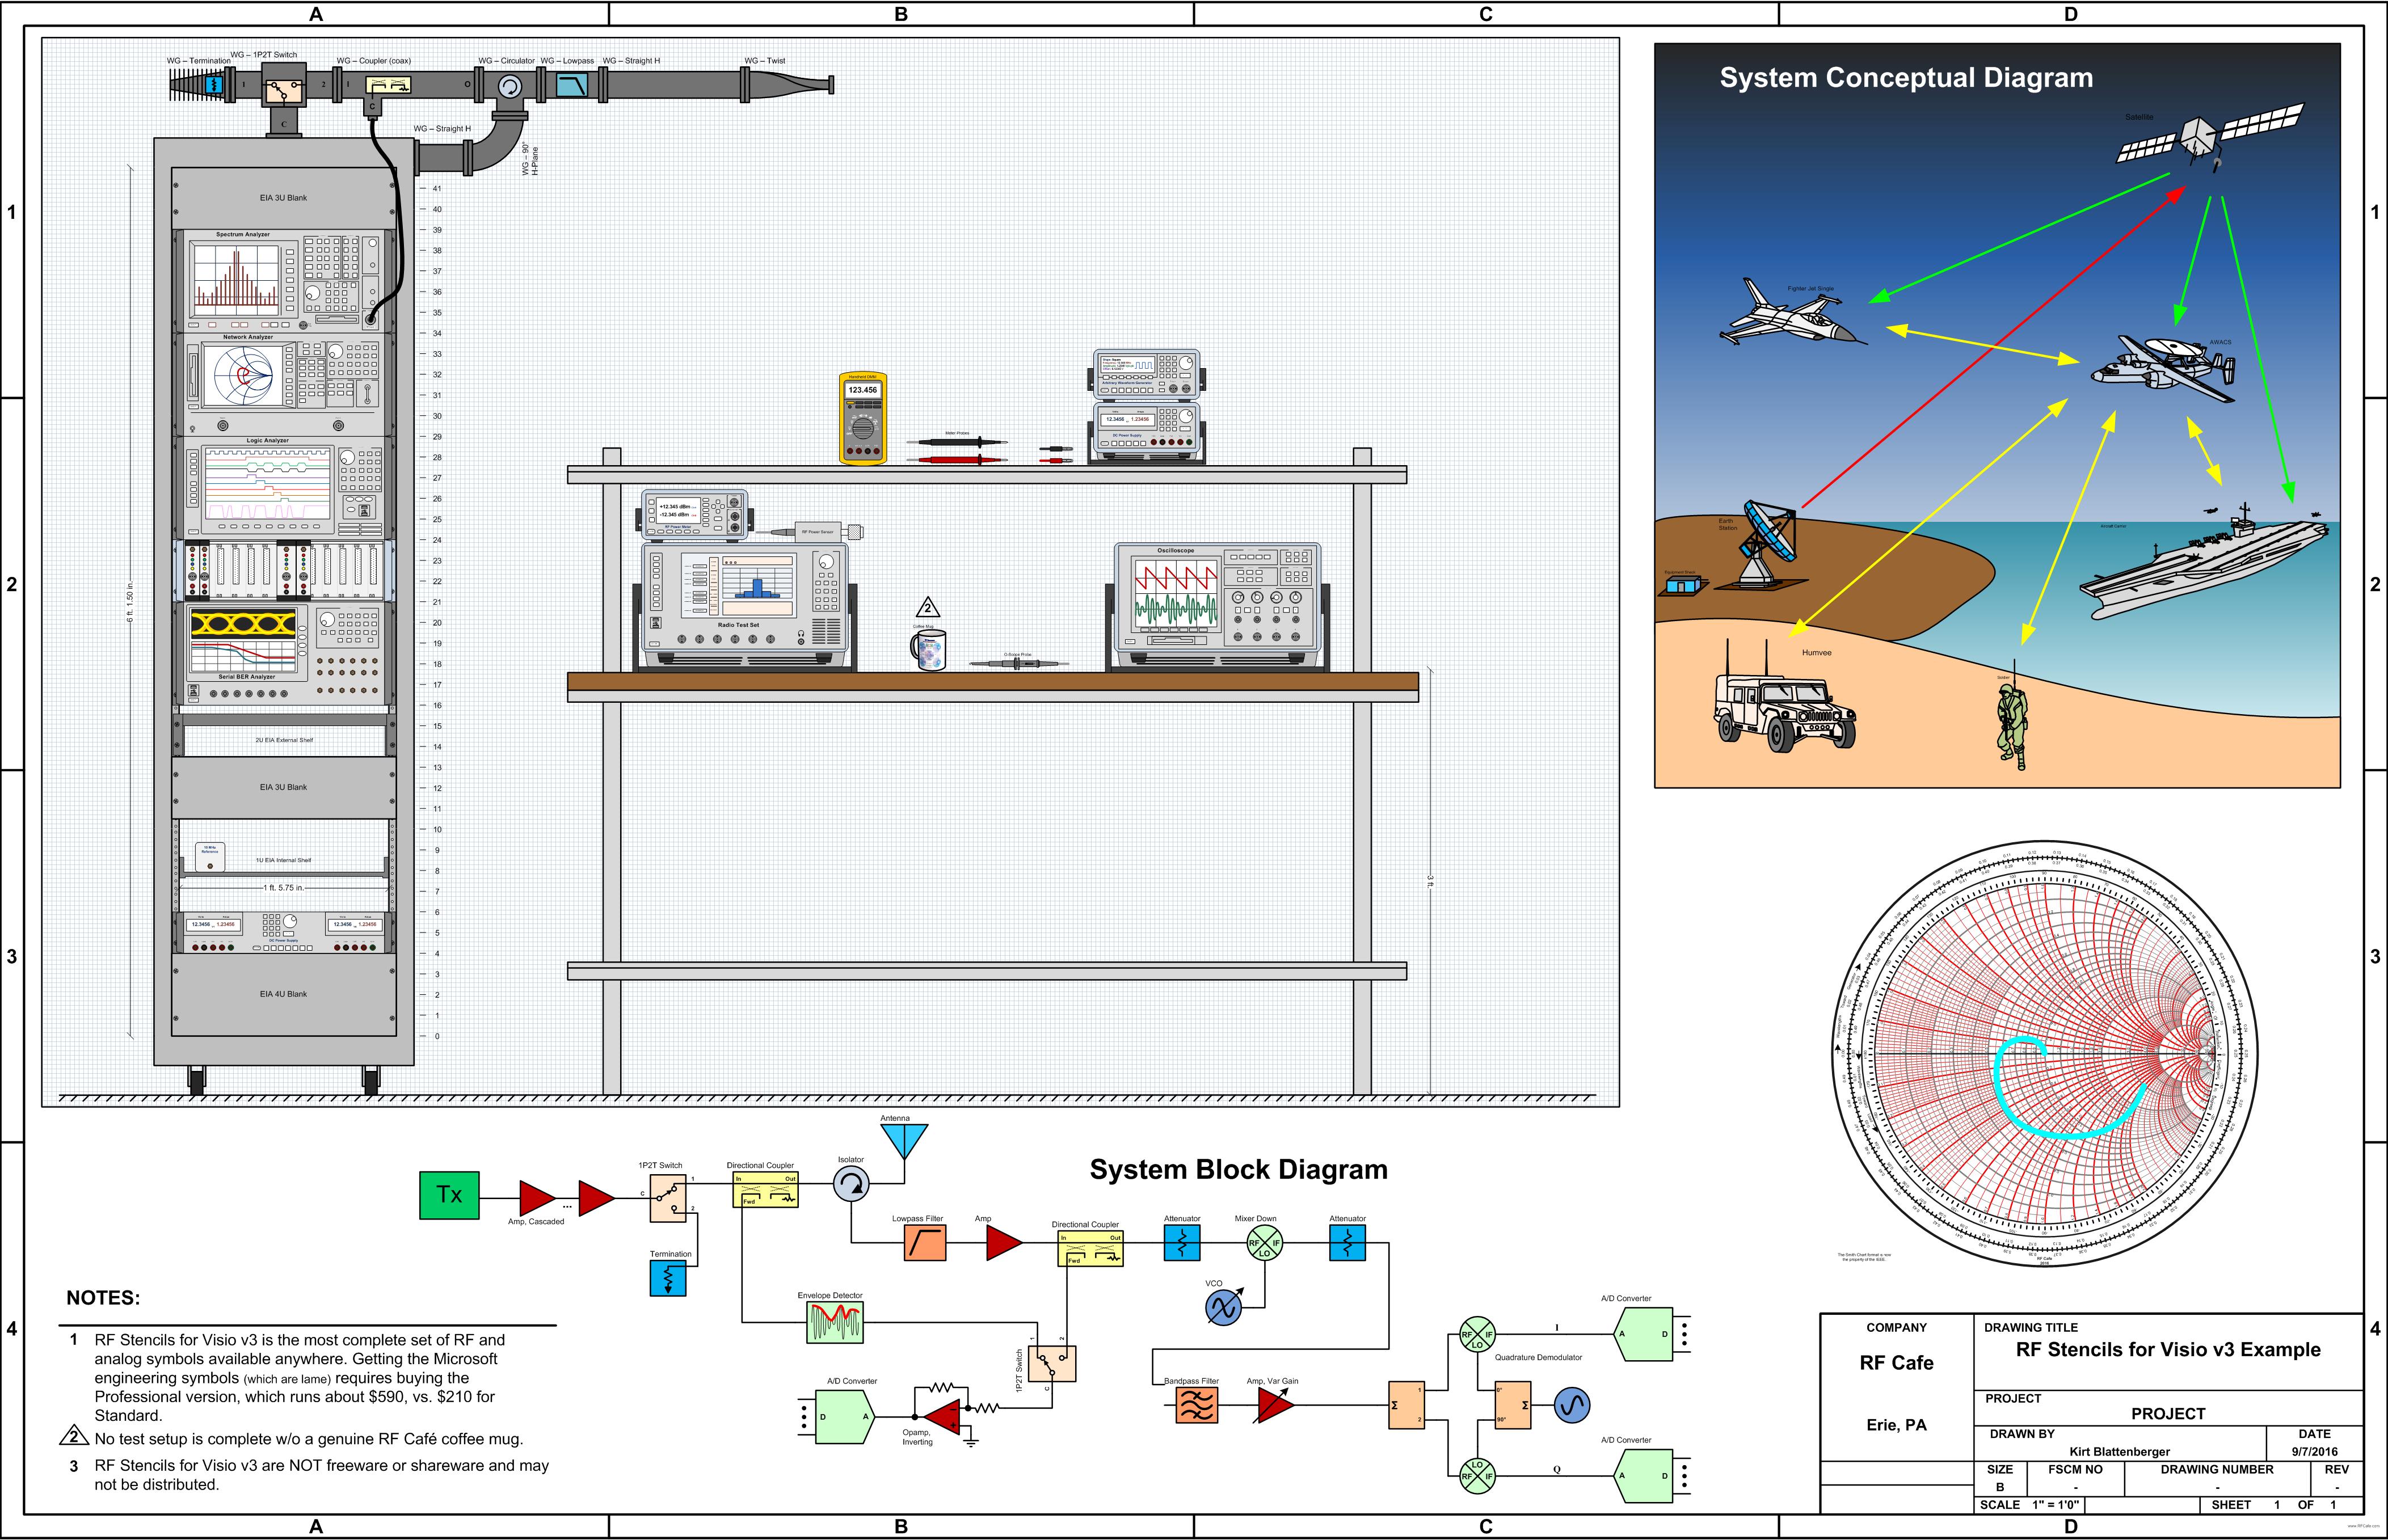 [DIAGRAM_4PO]  21 Auto Visio Network Diagram Stencils References,  http://bookingritzcarlton.info/21-auto-visio-network-diagram-ste… | Visio  network diagram, Floor plans, Templates | Car Wiring Diagram Visio |  | Pinterest